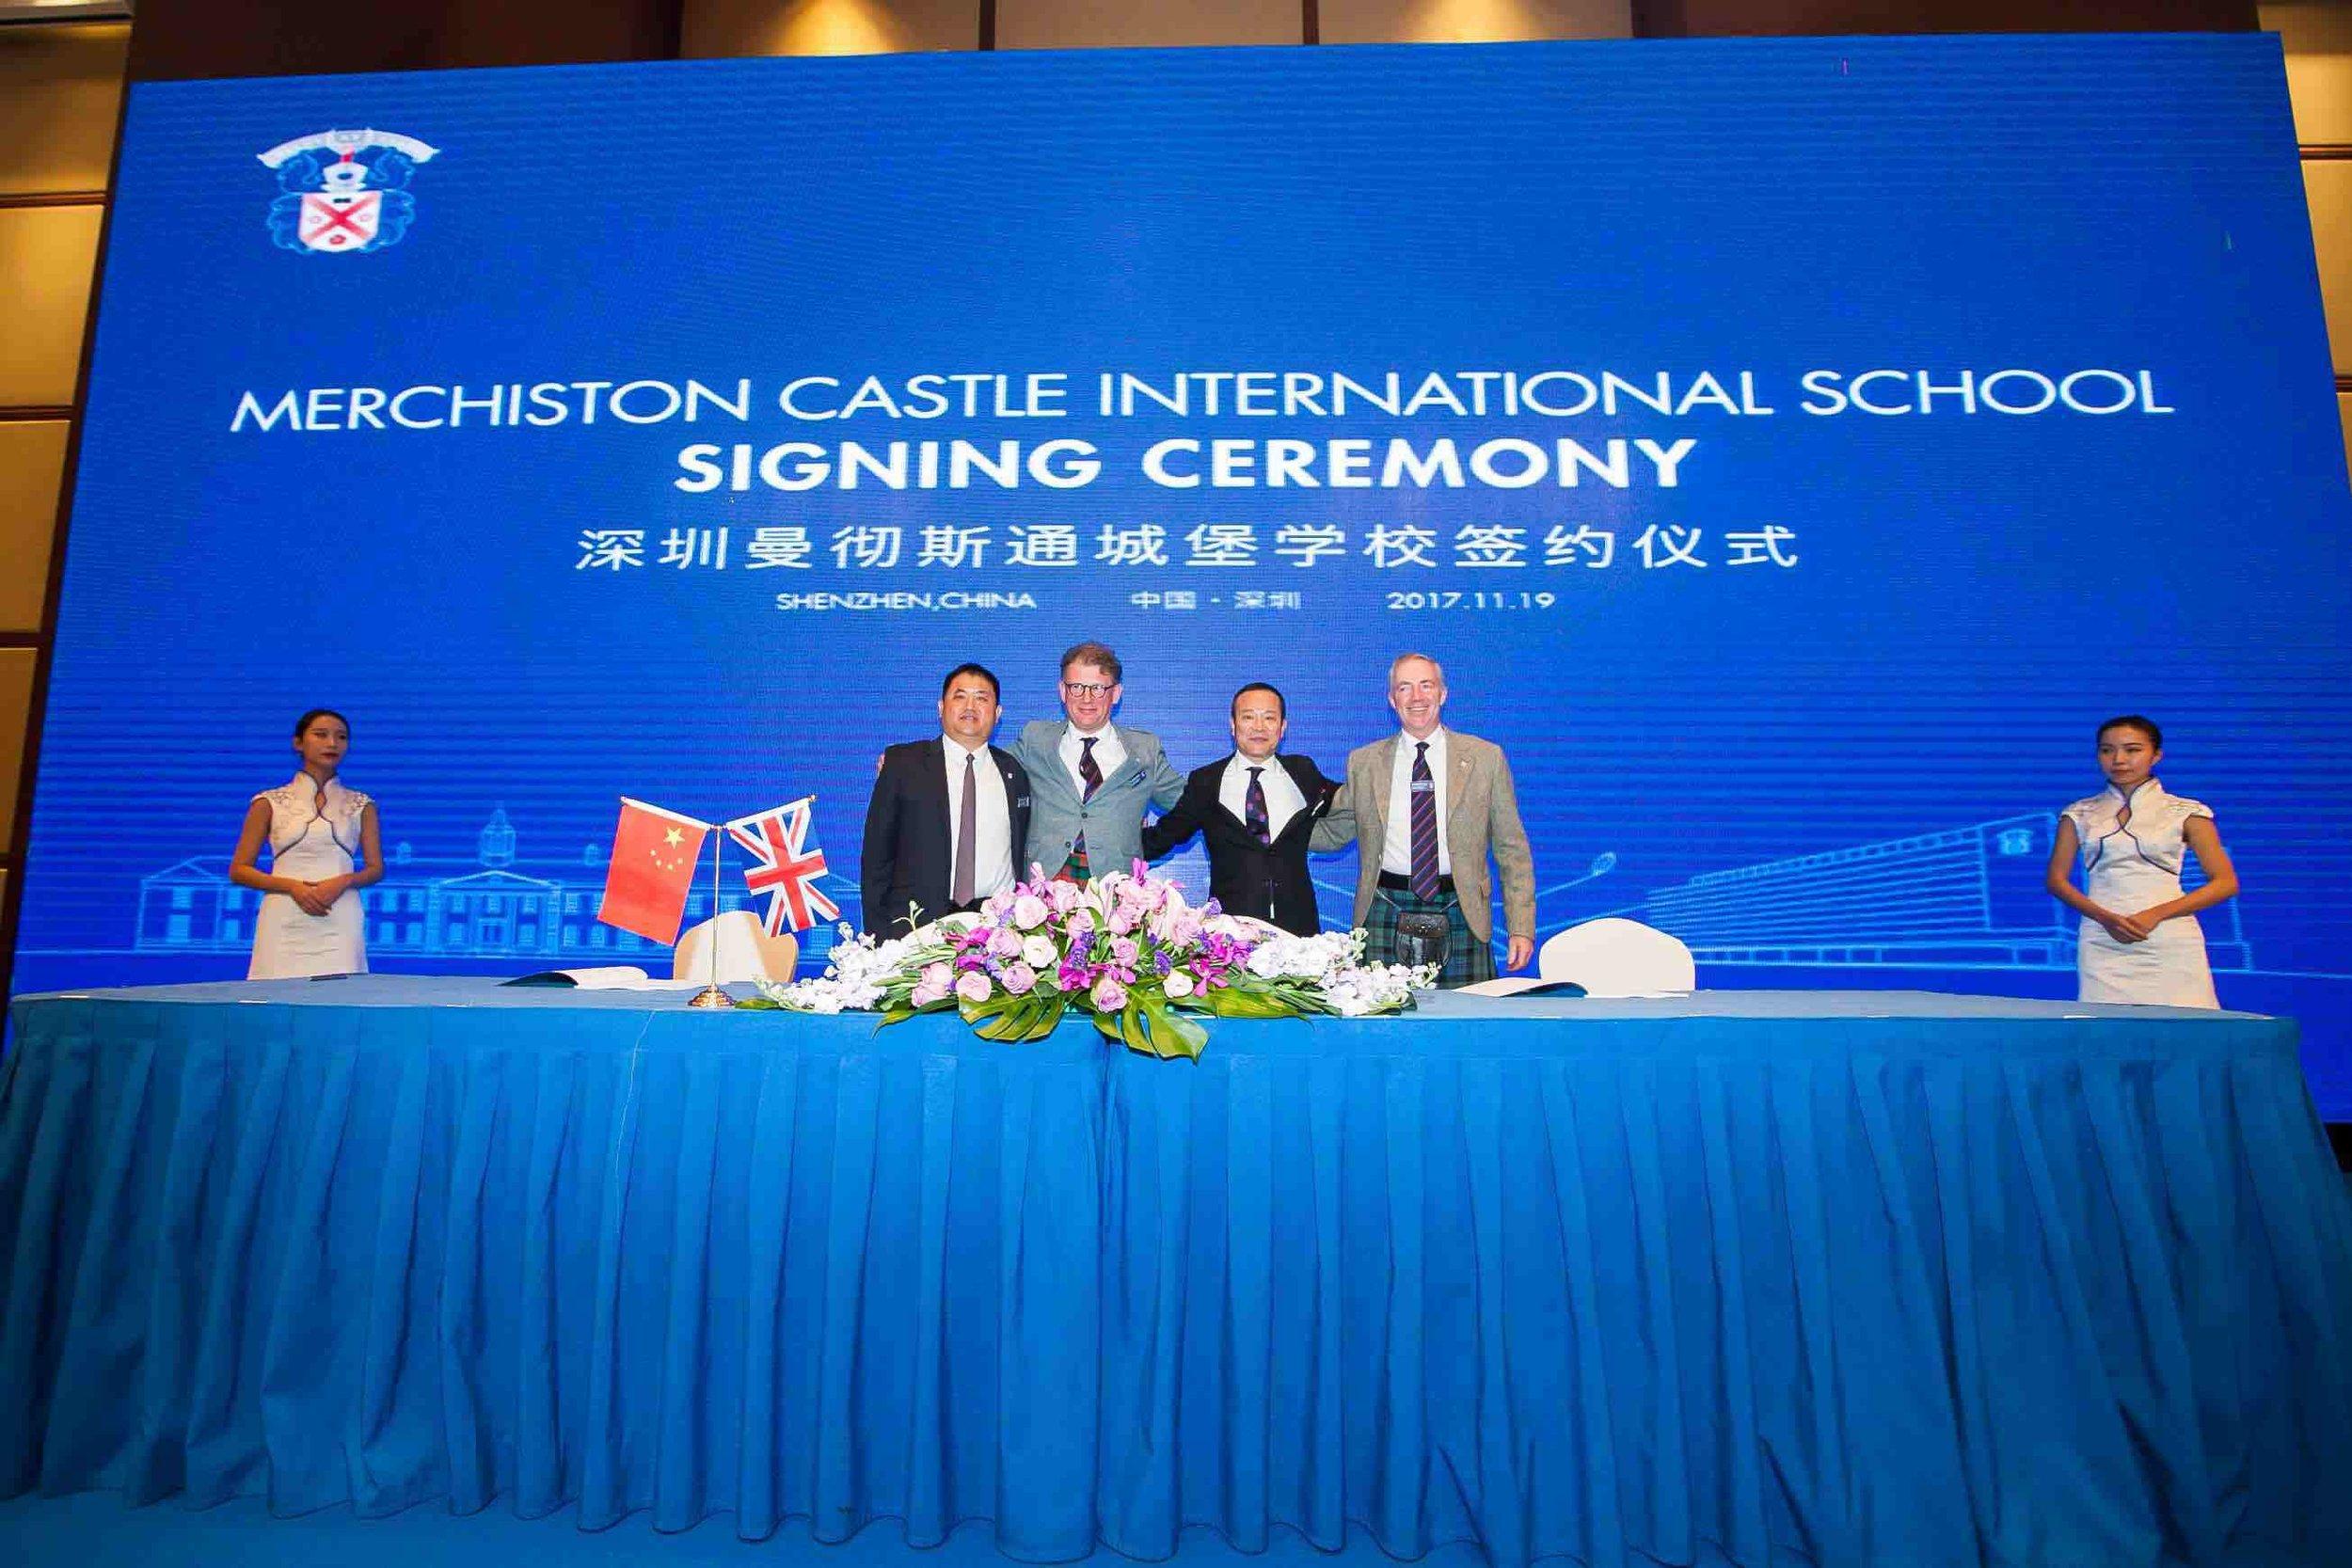 Signing-Ceremony-1.jpg